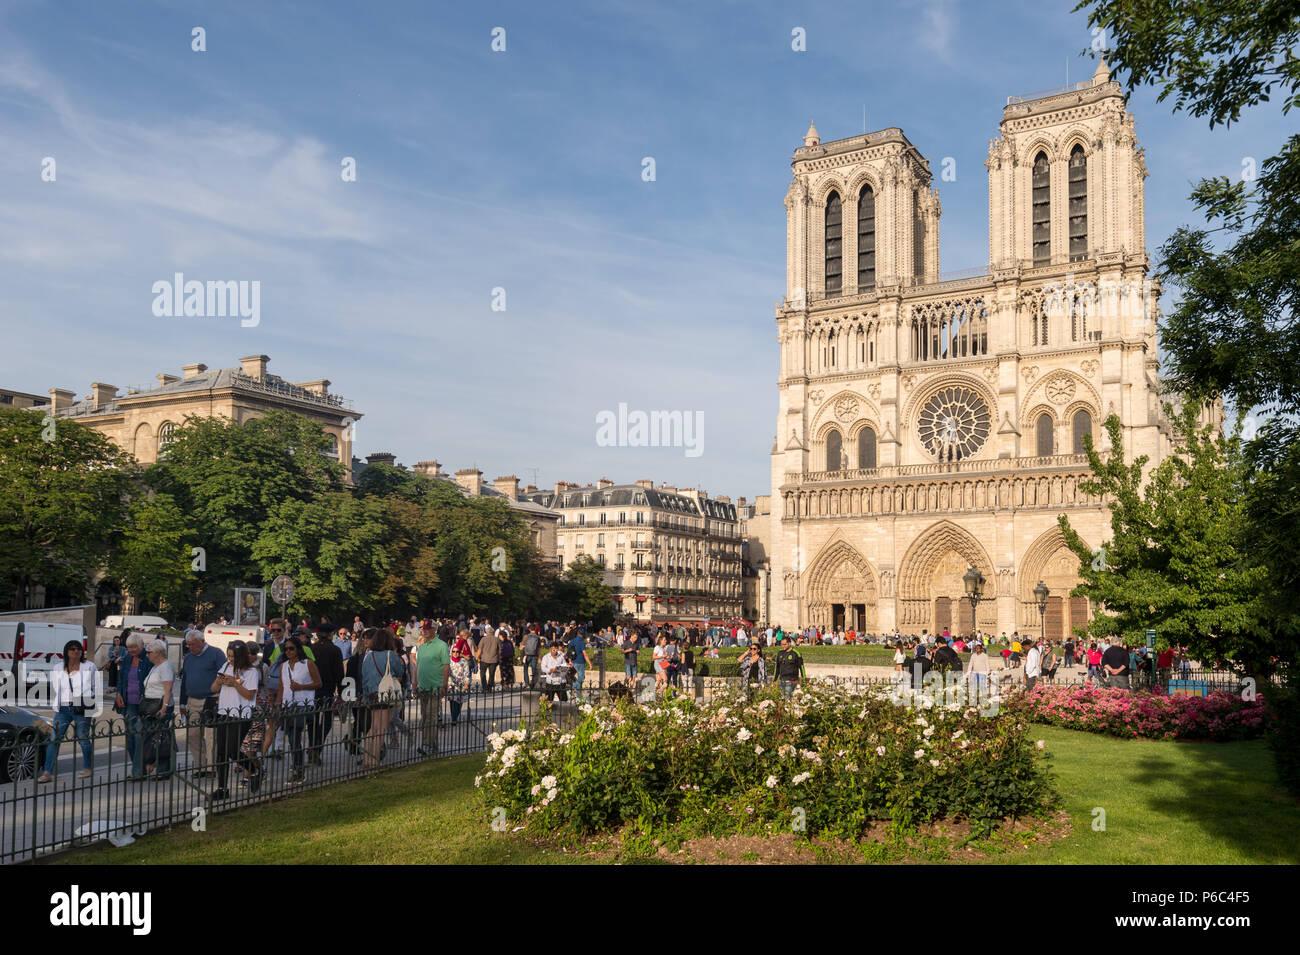 Paris, France - 24 June 2018: Tourists visiting Notre-Dame Cathedrale. Stock Photo